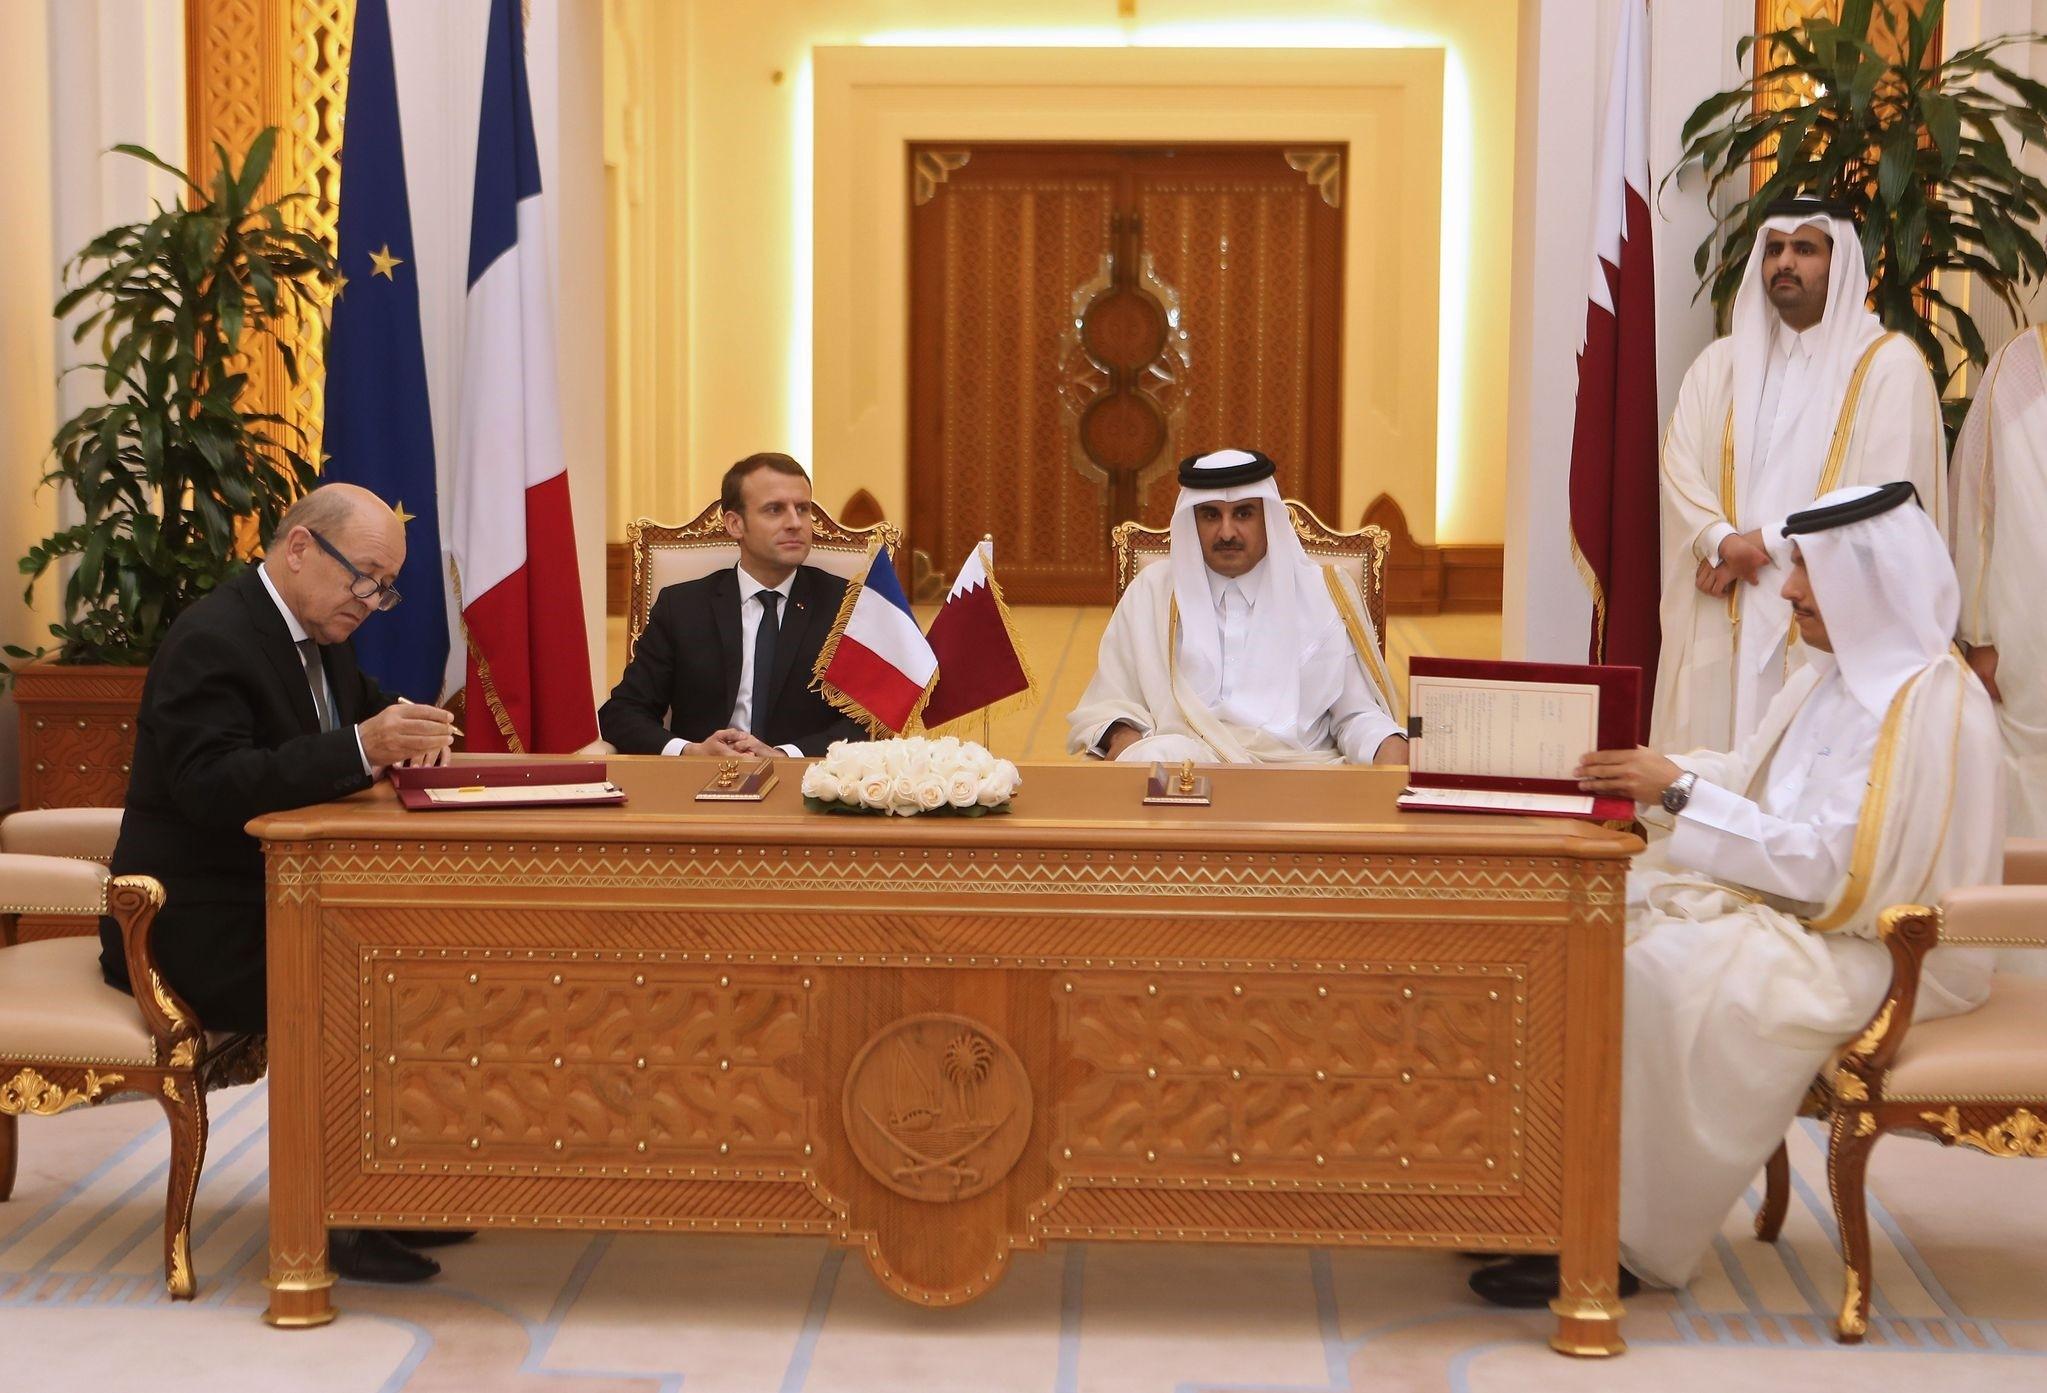 Macron (C-L), Qatari Emir Sheikh Tamim bin Hamad al-Thani (C-R) watch French Foreign Minister Jean-Yves Le Drian and his Qatari counterpart Mohammed bin Abdulrahman al-Thani (R) sign bilateral agreements in Doha on December 7, 2017. (AFP Photo)